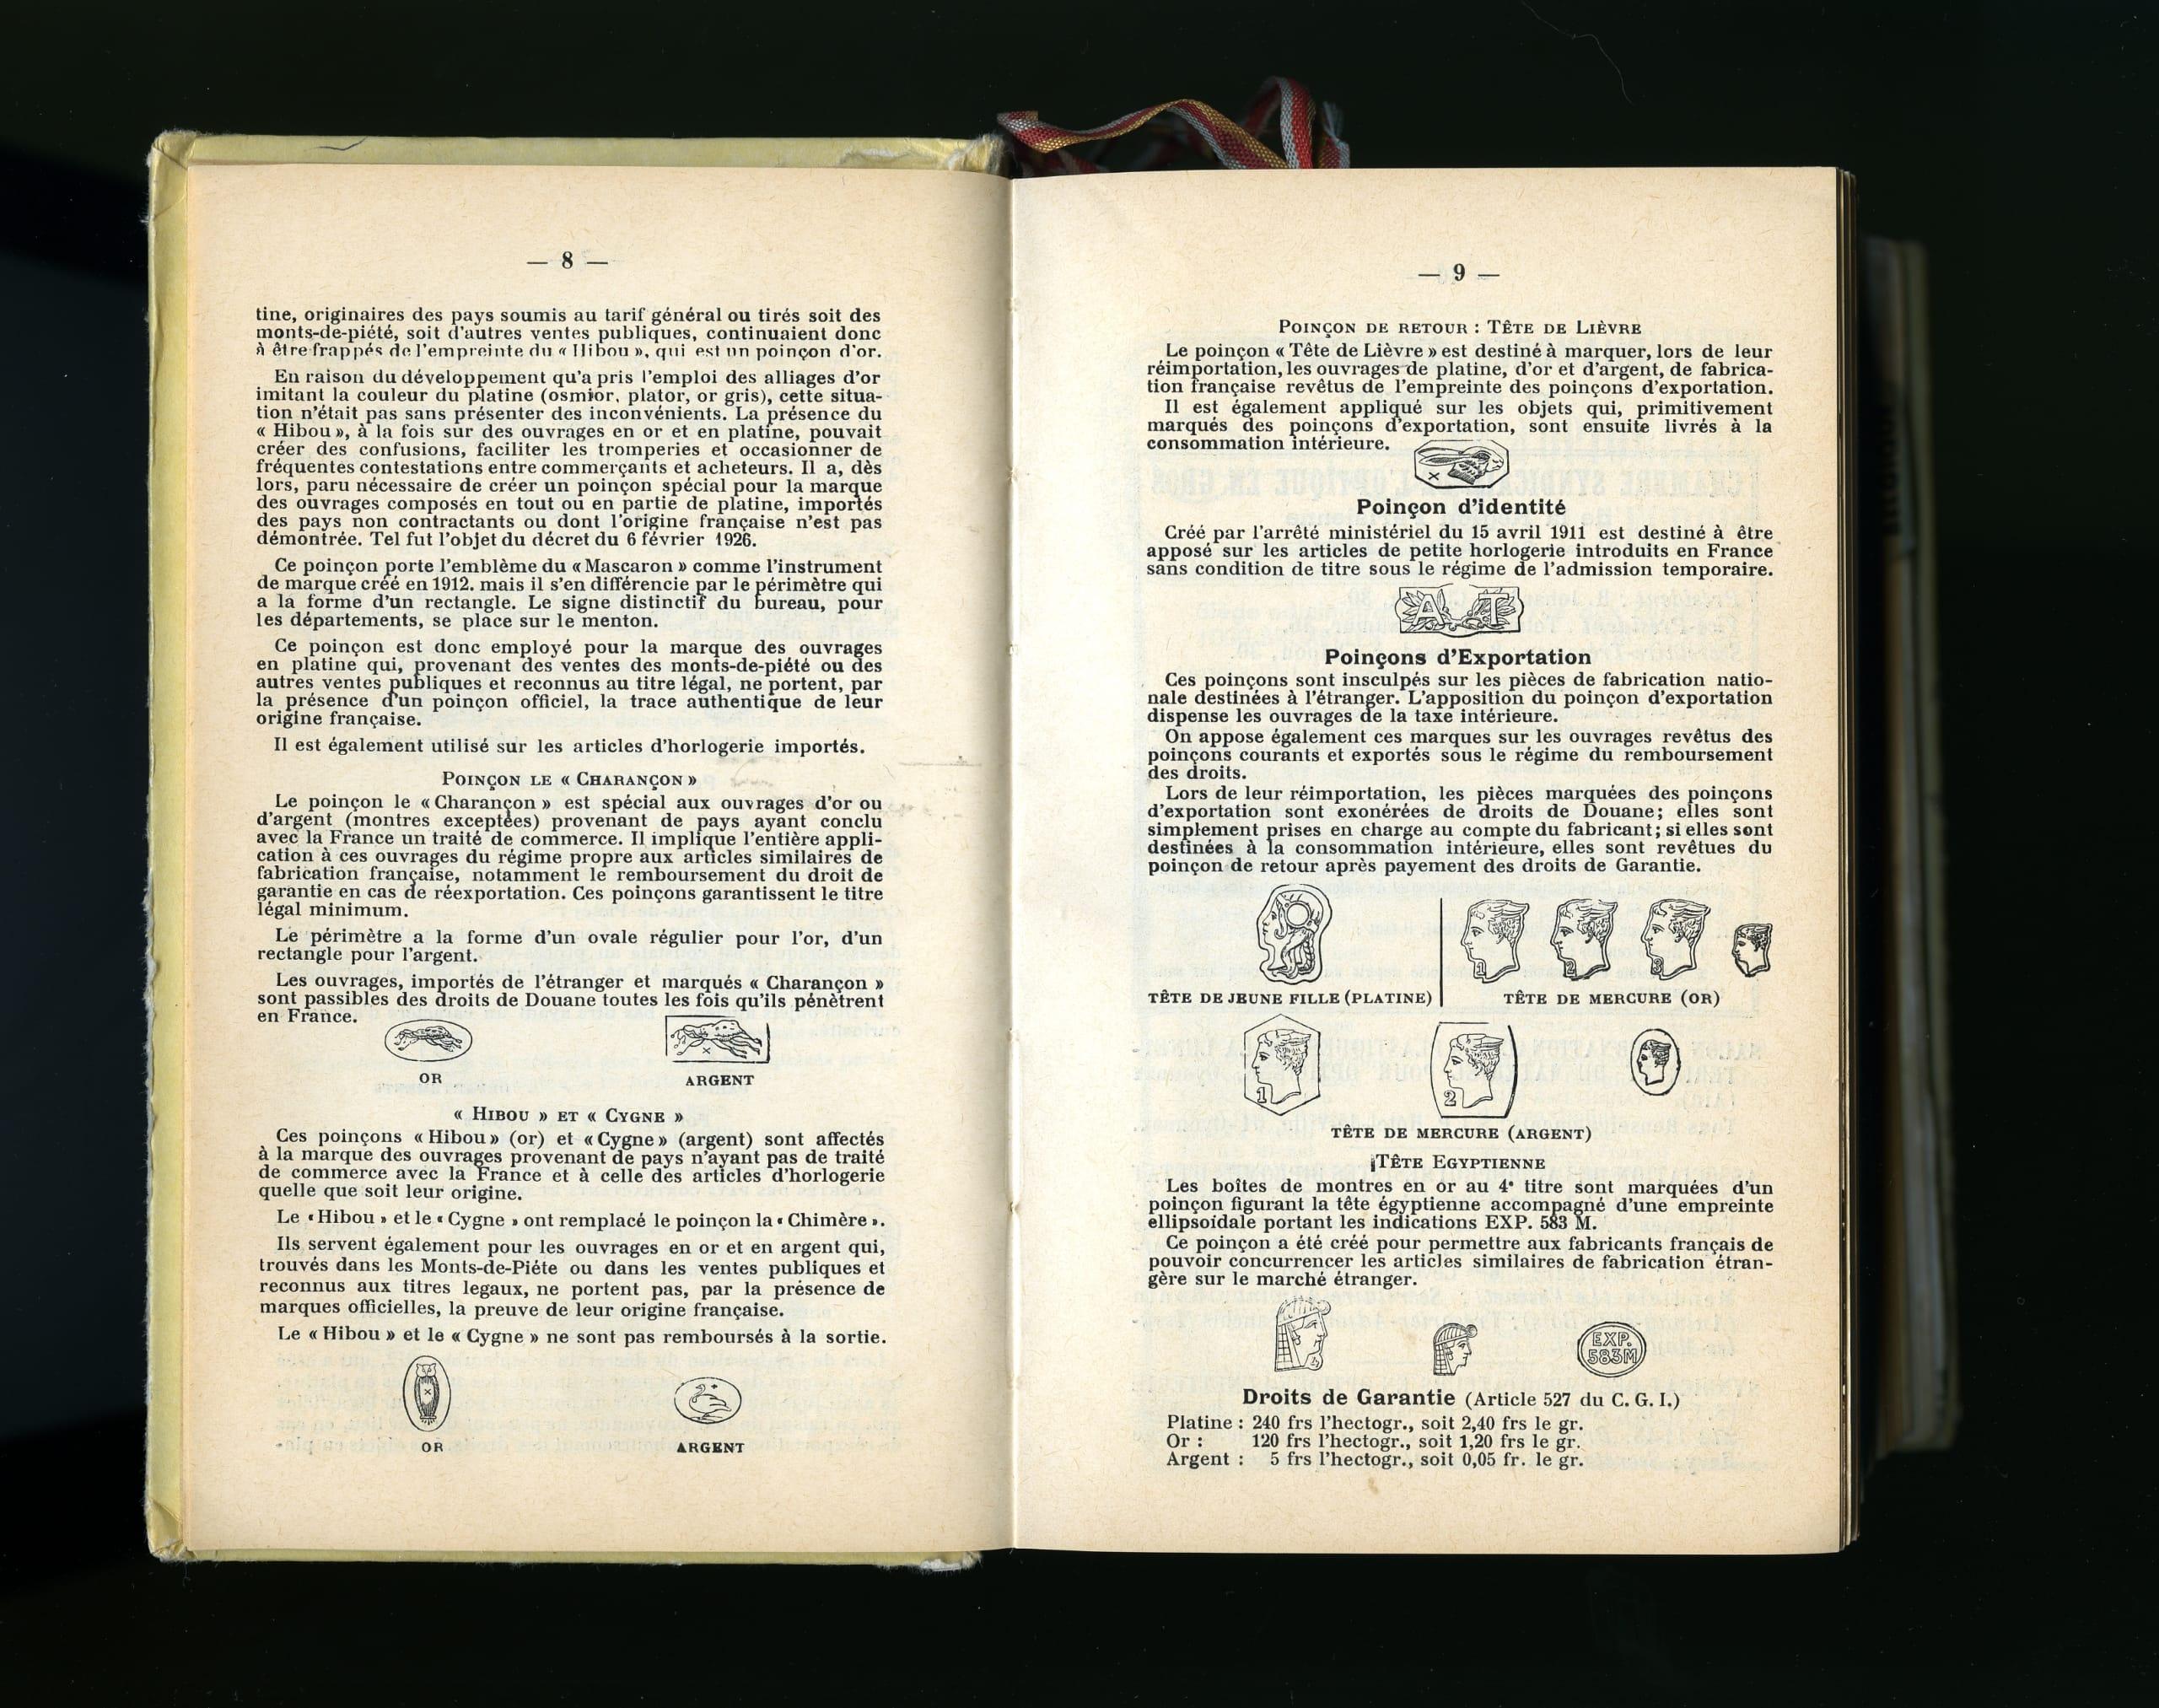 Bidules - Latest - Official Hallmarks are official - illustration -  Lunetterie des Instruments de Précision published in 1970 by Azur-Editions.